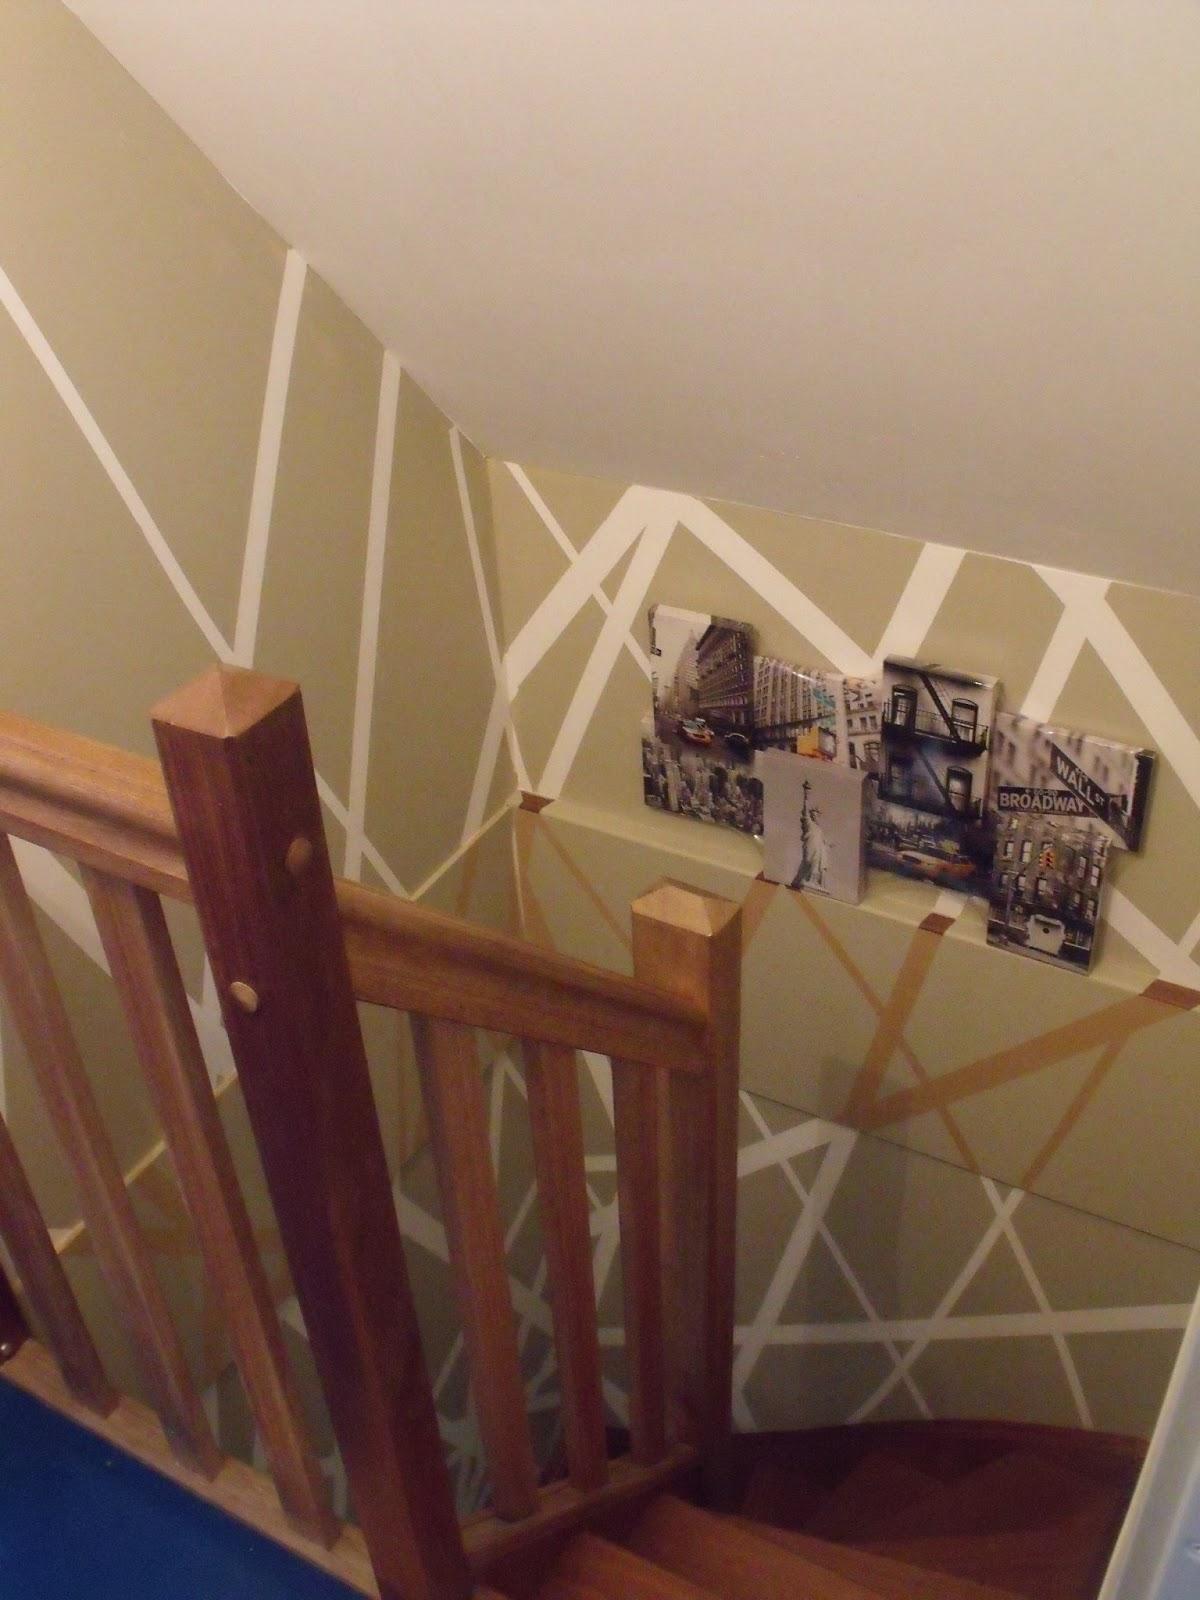 Bricolart - Montee d escalier peinture ...